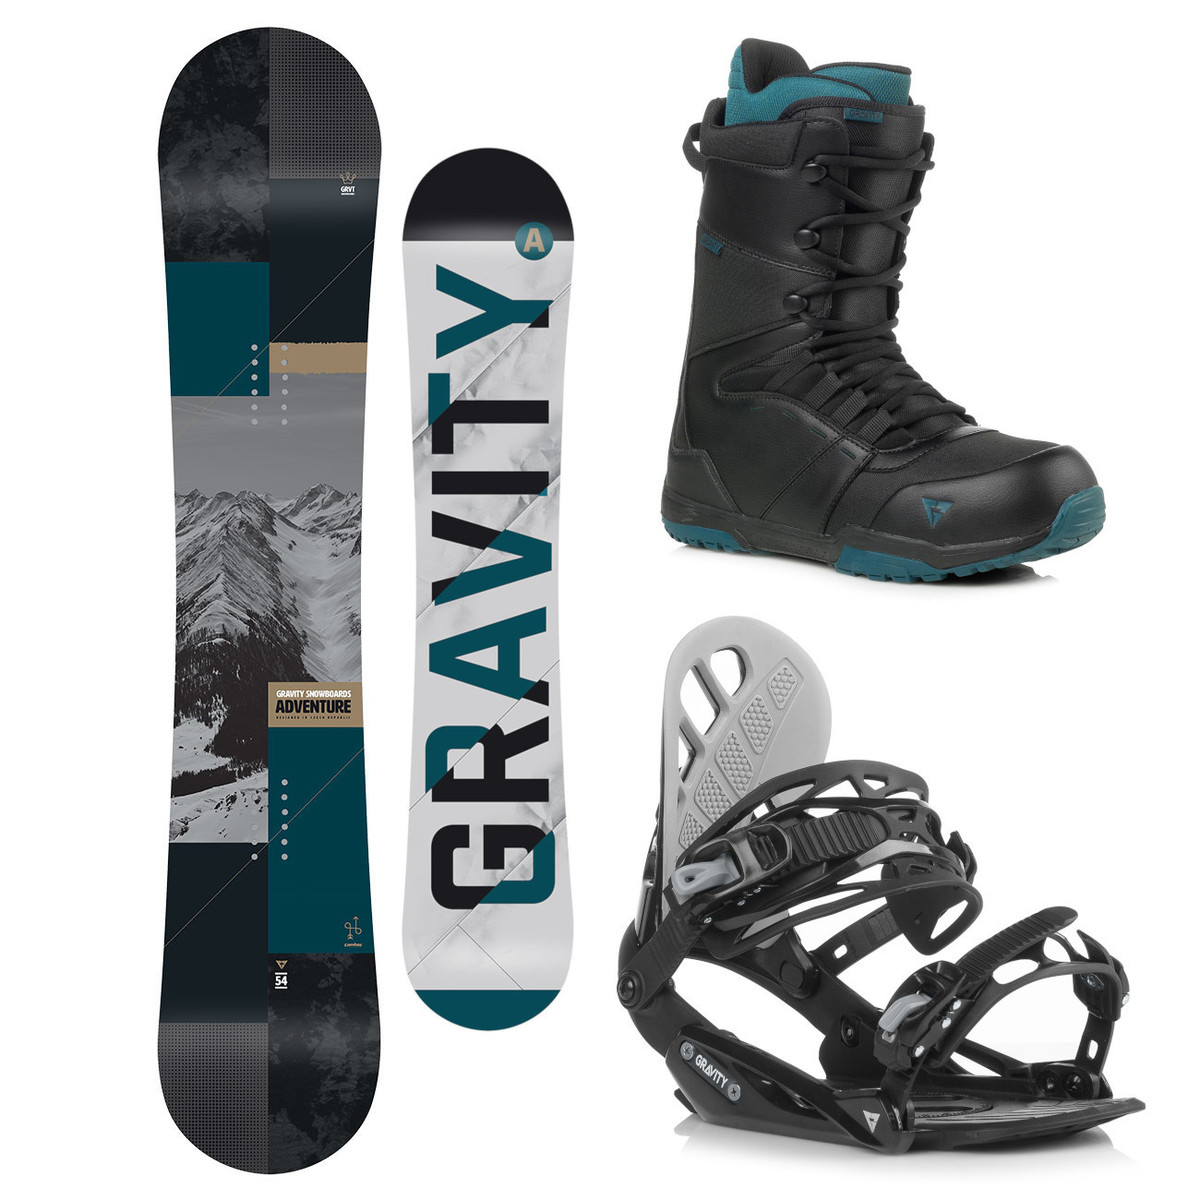 Snowboardový komplet Gravity Adventure 18/19 L (EU 42-48) 156